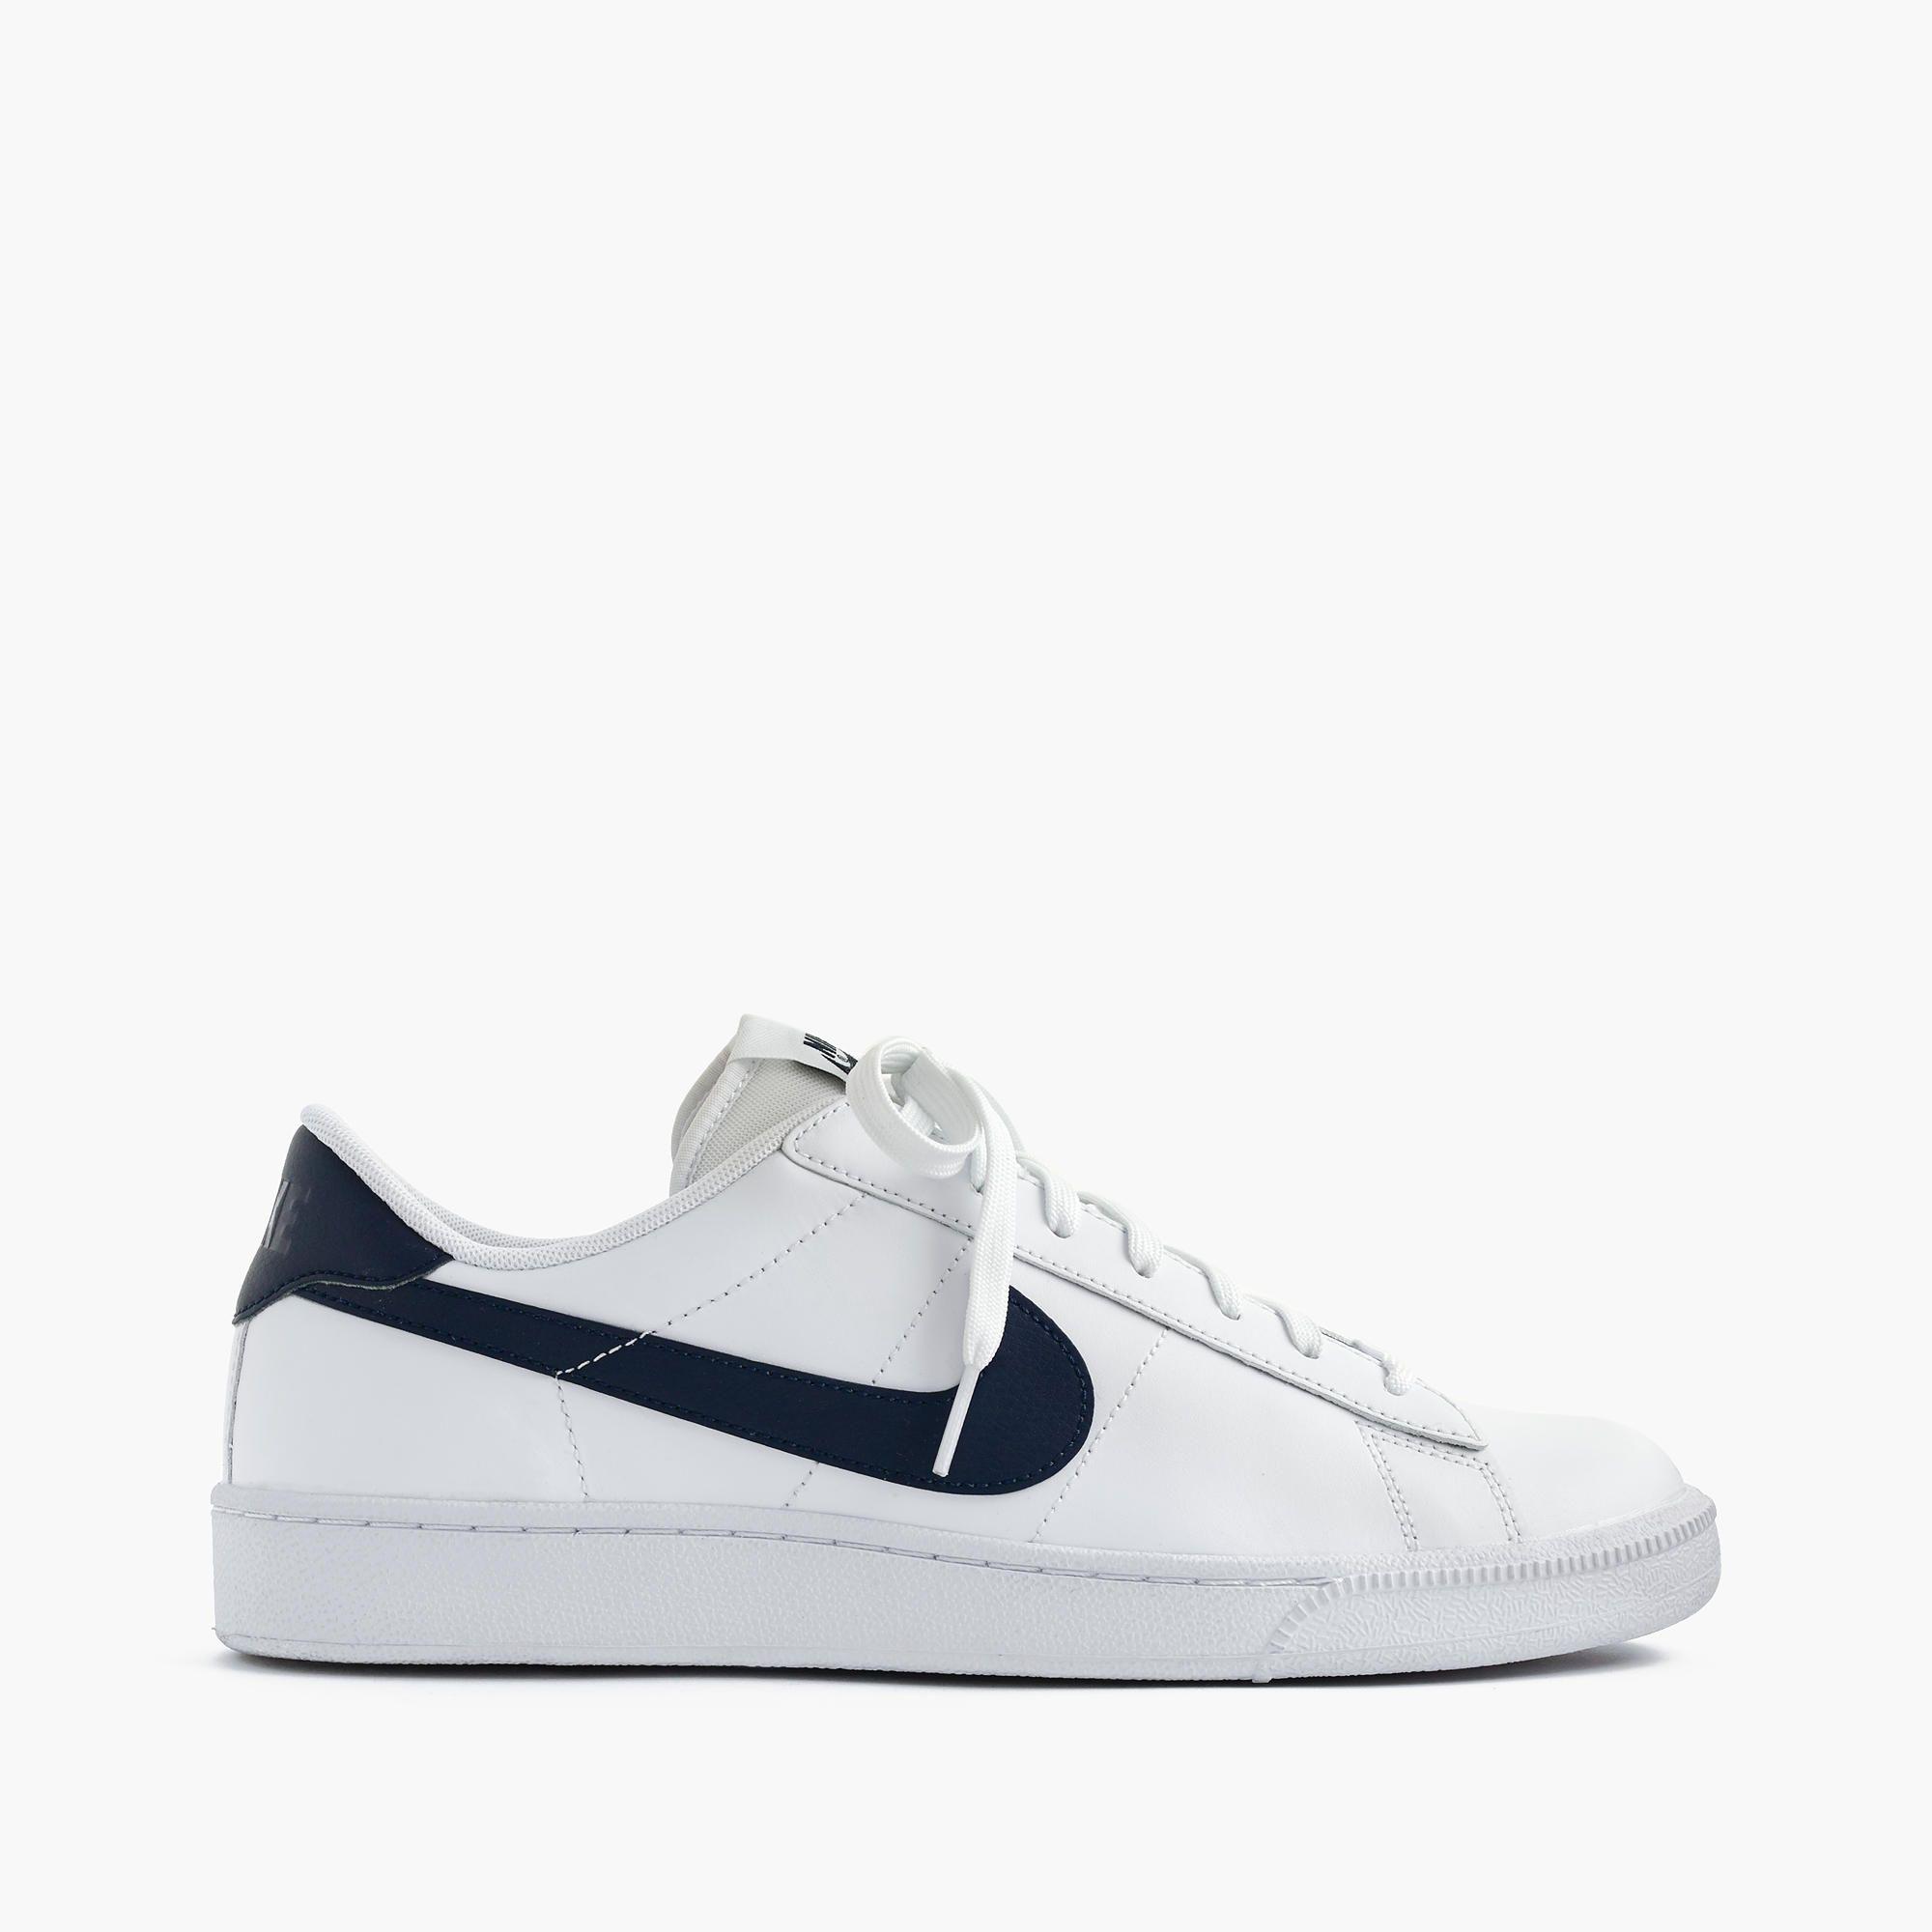 Nike Tennis Classic Sneakers In White : Men's Sneakers